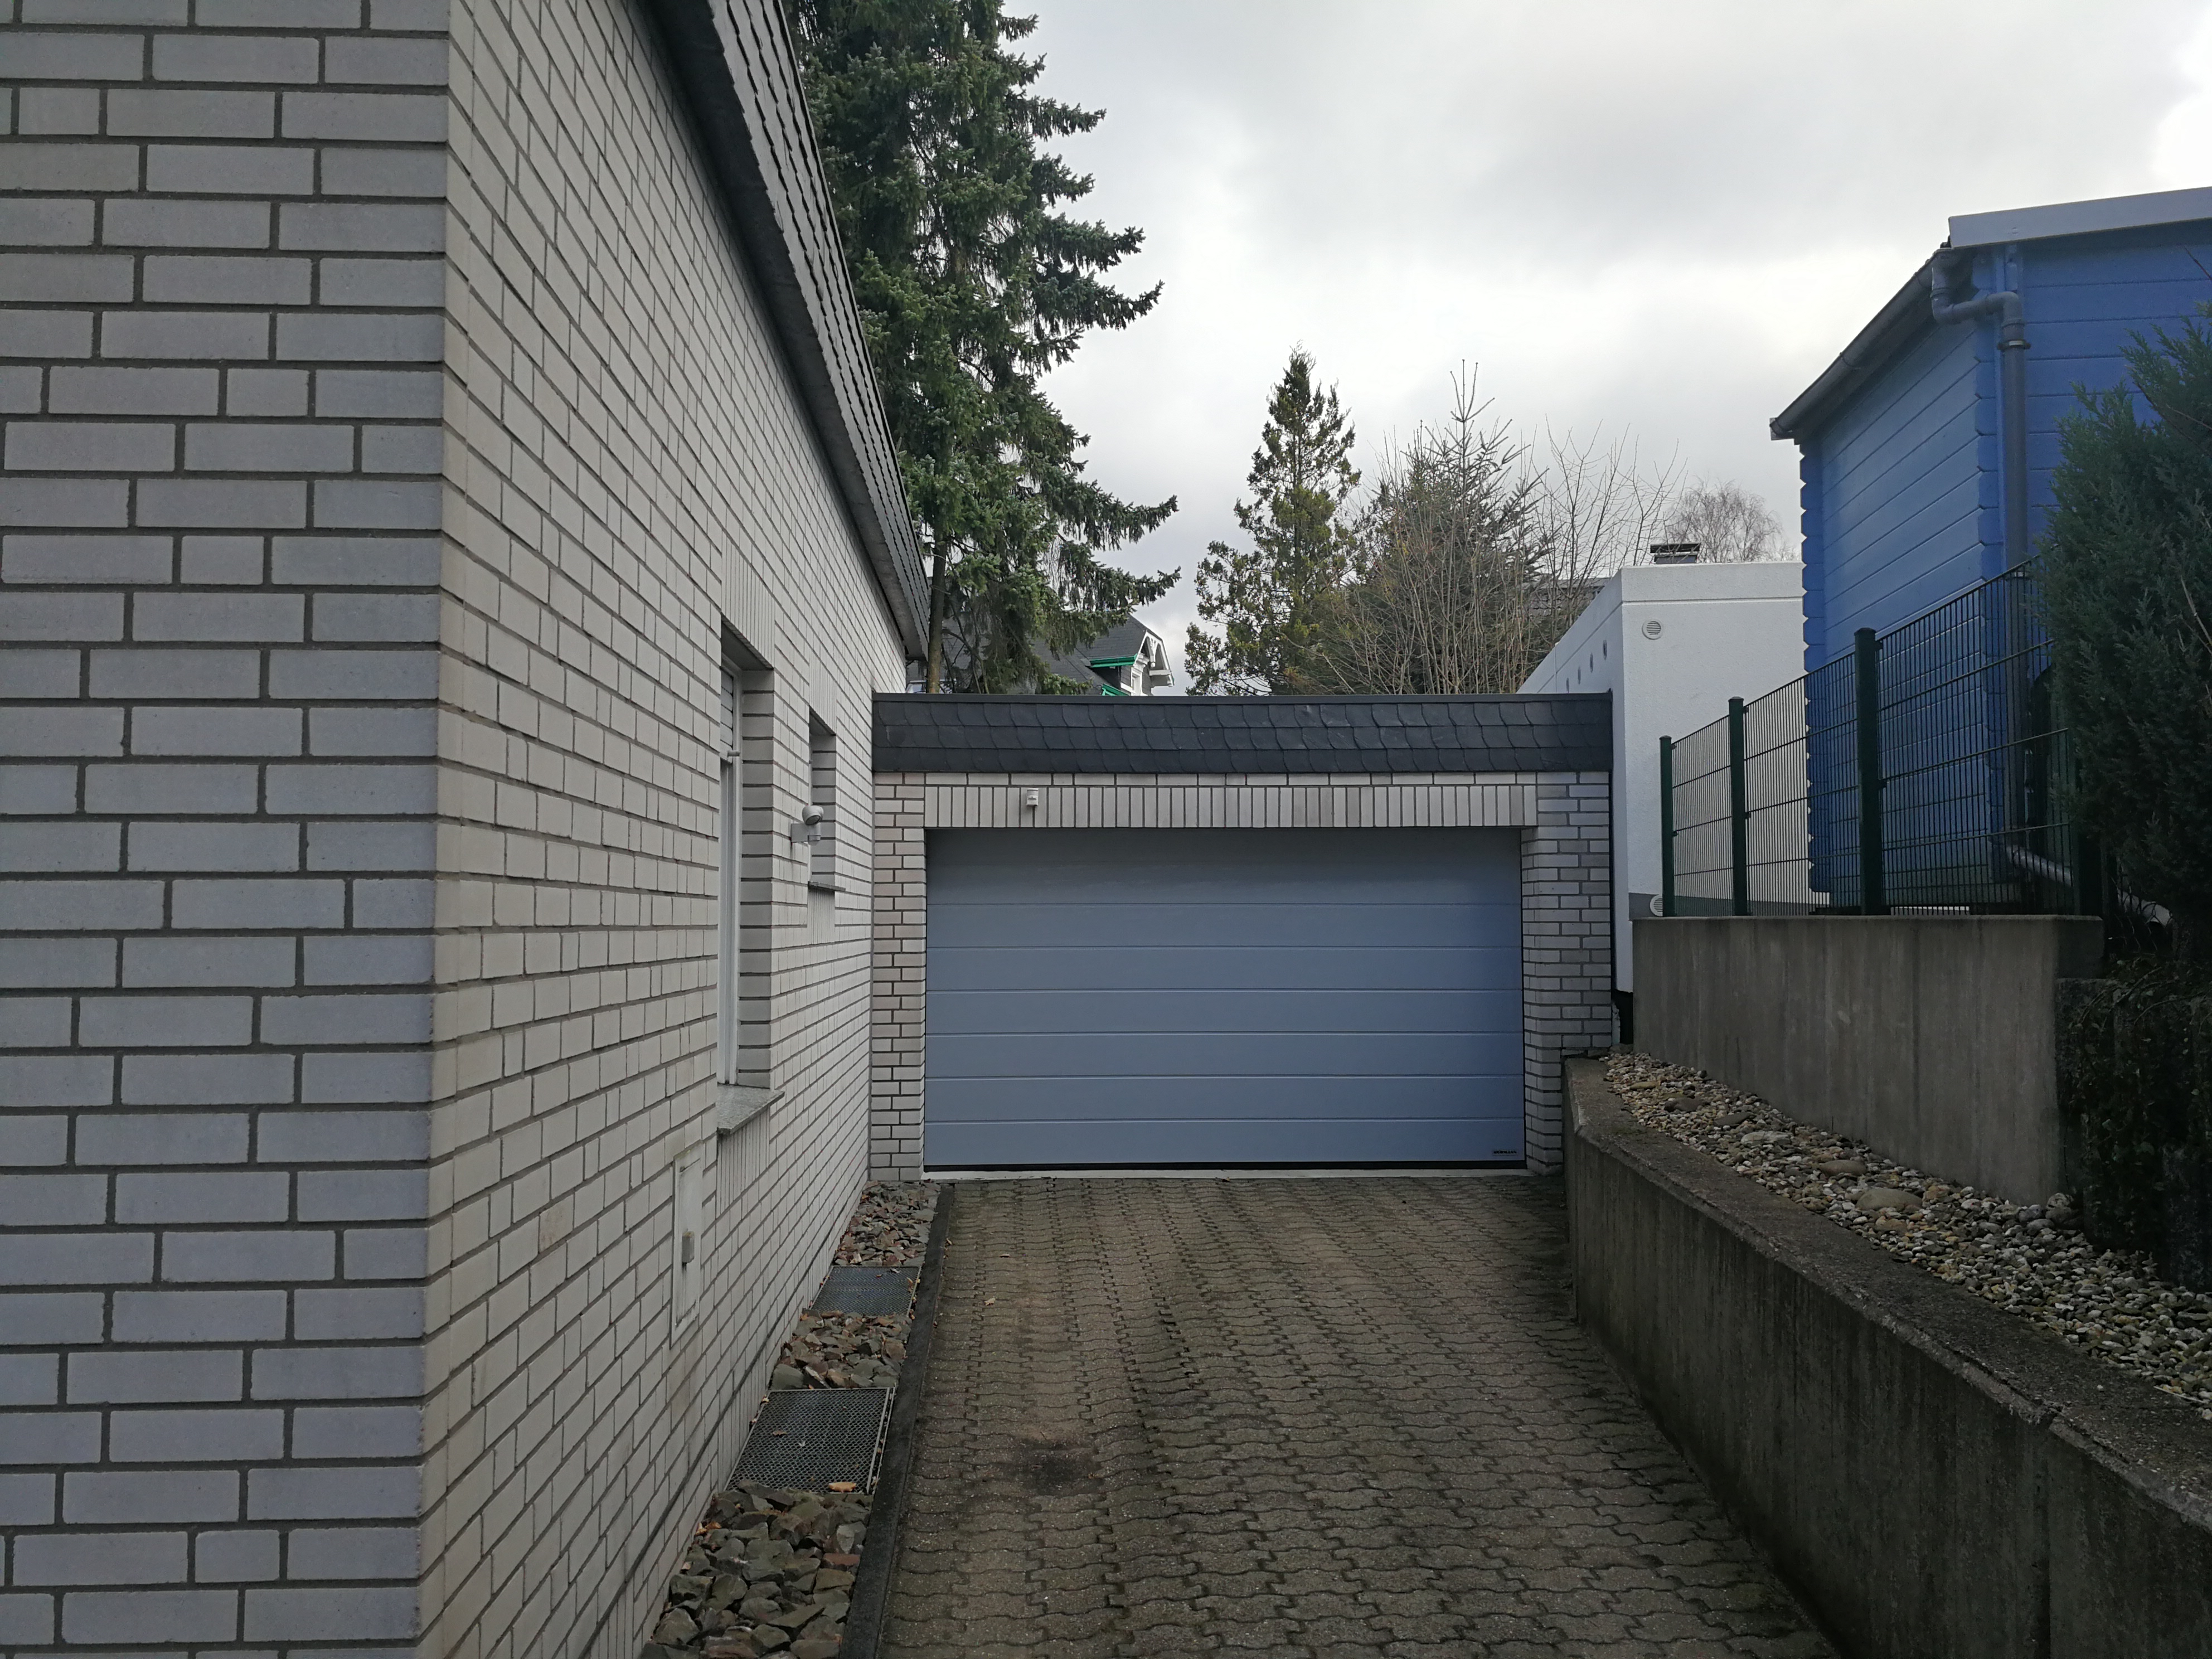 Garagentore Wuppertal uncategorised